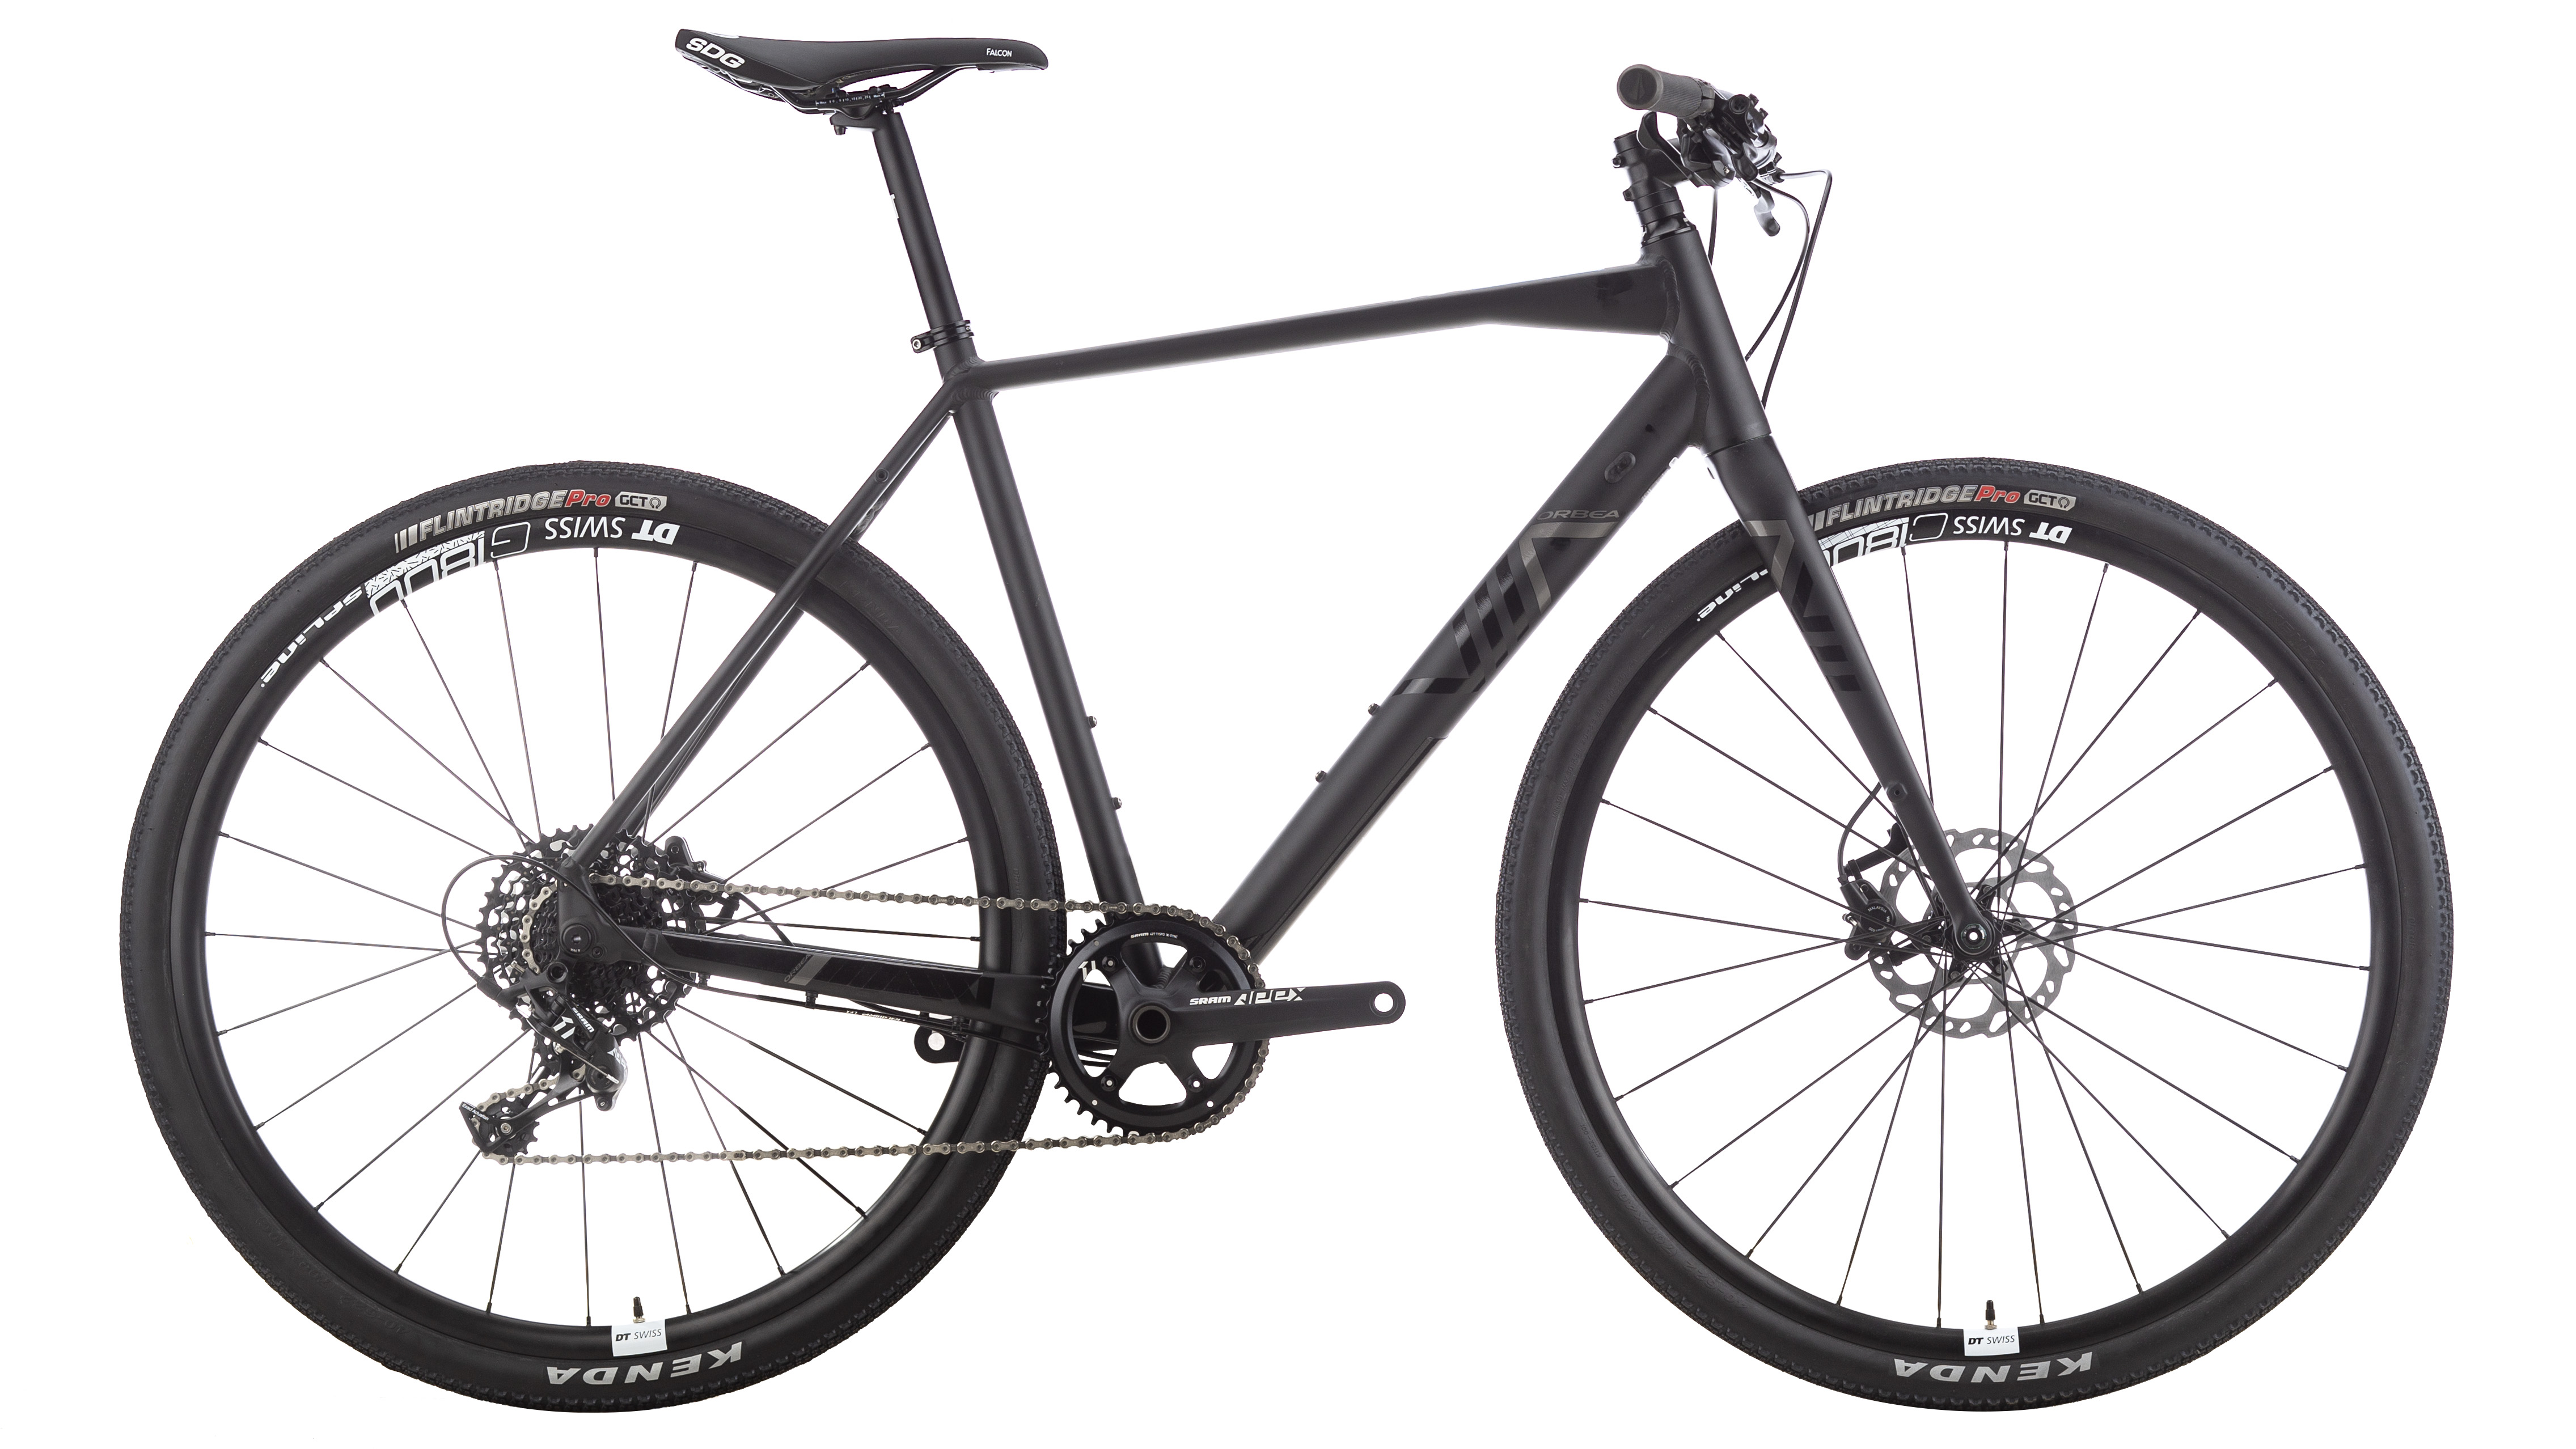 Orbea Terra Apex 1 CX bike